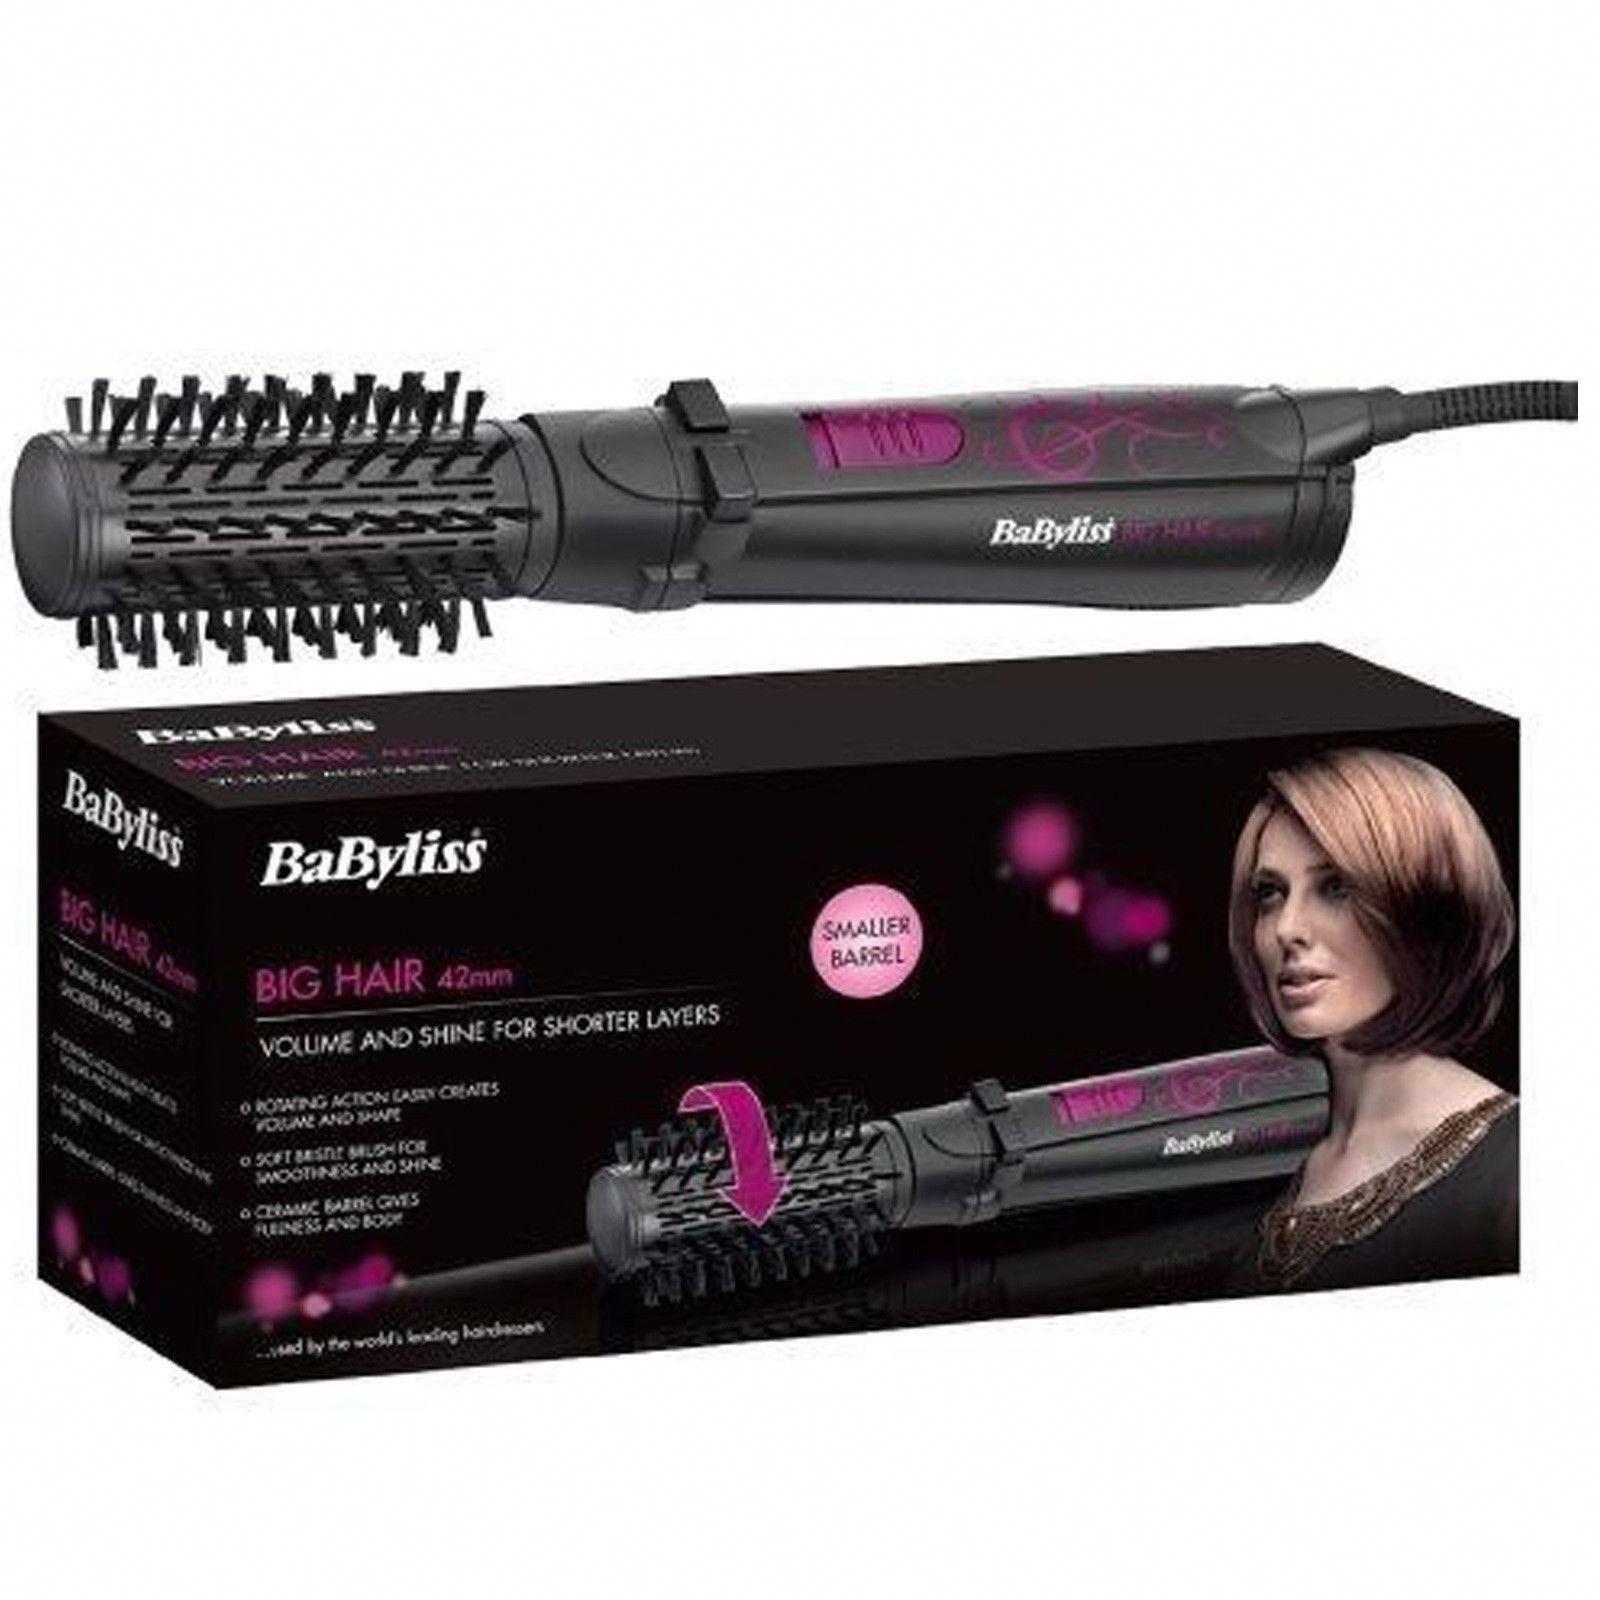 Babyliss 2777u Big Hair Rotating Hot Air Brush 42mm Hair Styler Soft Bristles Nocasualtywanted Hair Styler Big Hair Hair Tools